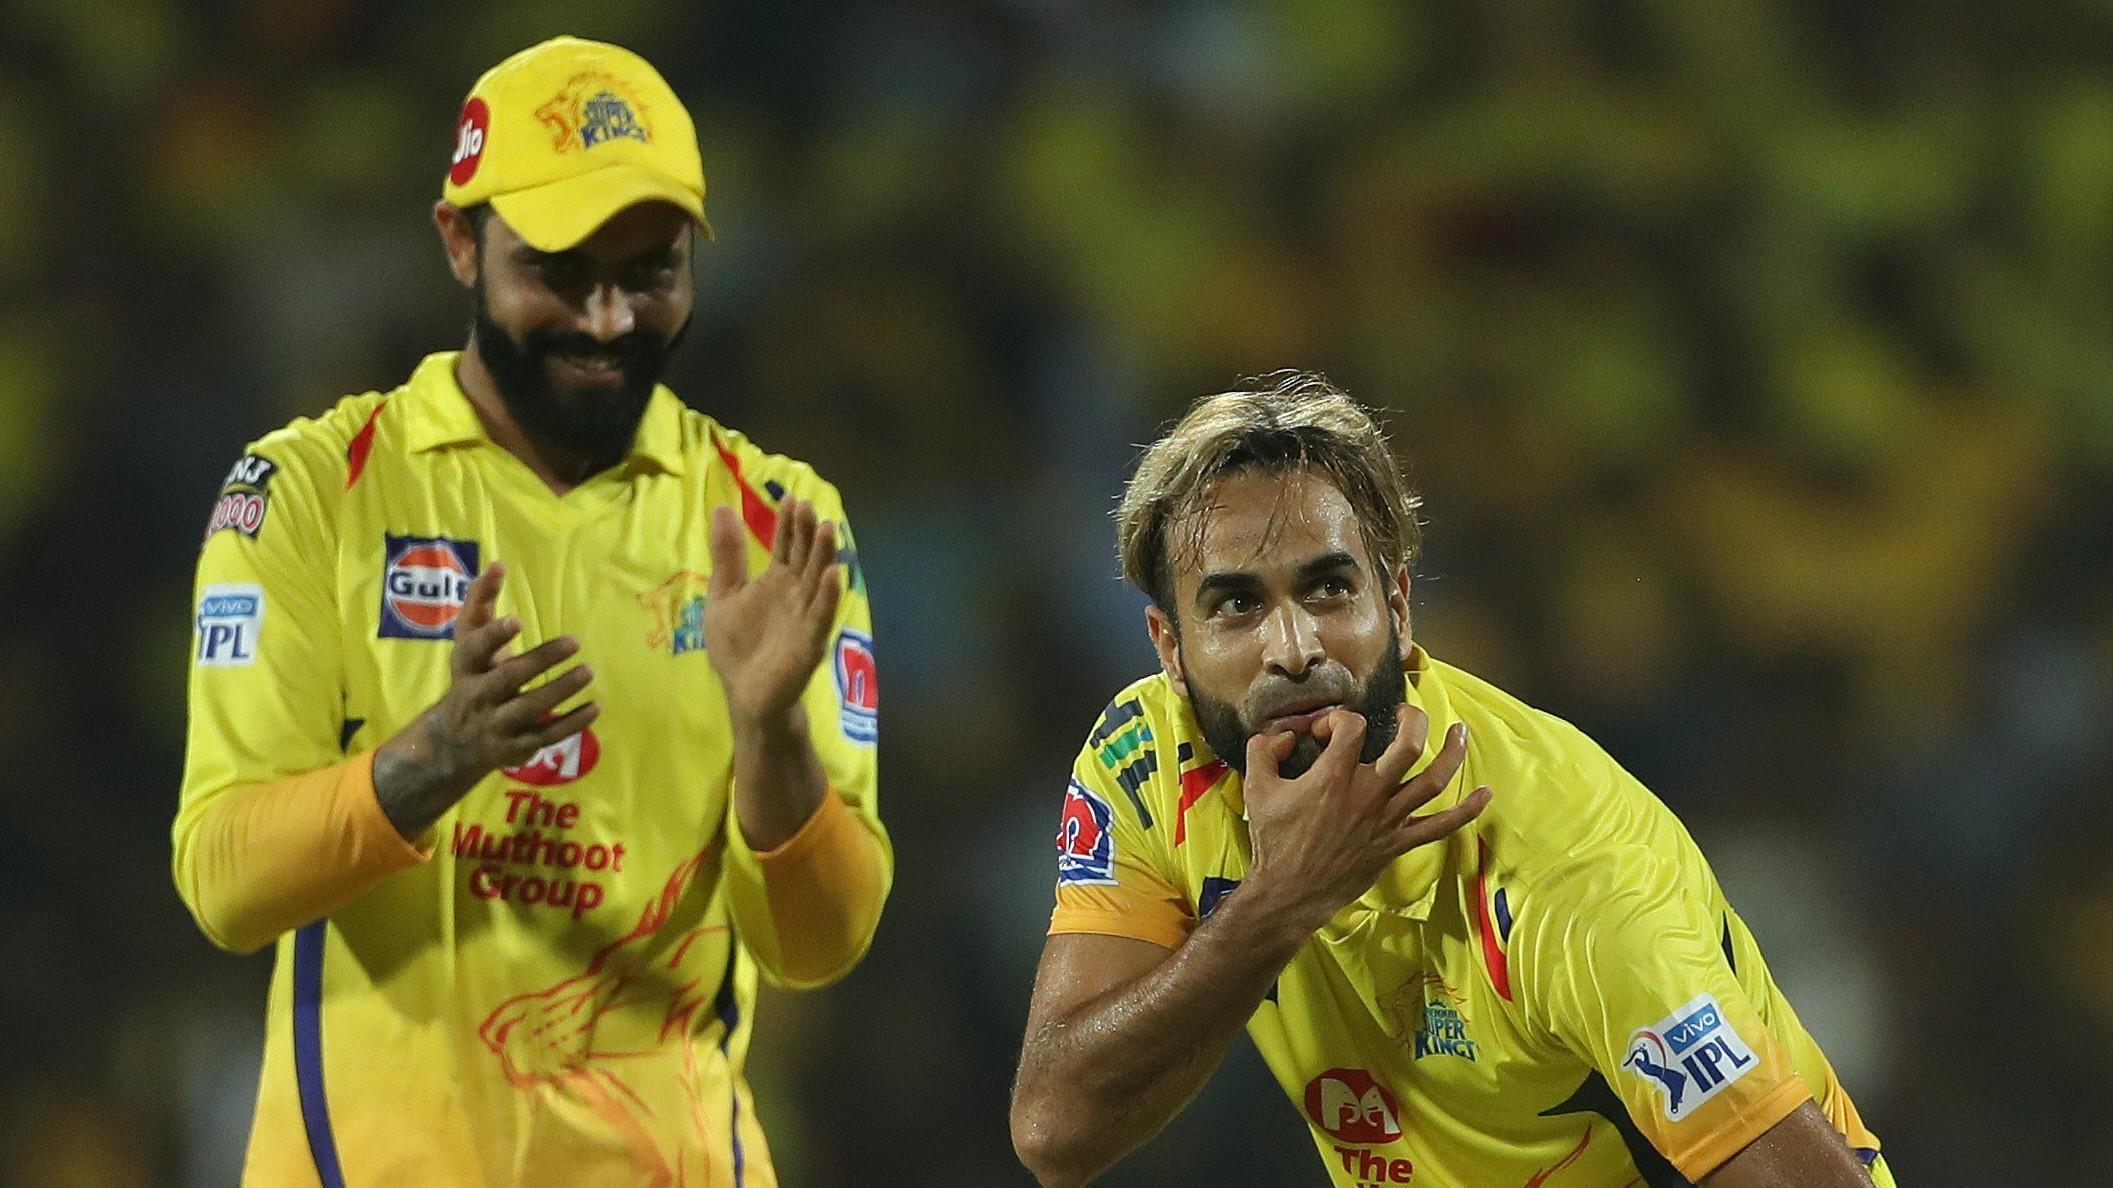 IPL 2019: कोलकाता नाईट राइडर्स को हराकर पॉइंट टेबल में पहले स्थान पर पहुंची चेन्नई सुपर किंग्स